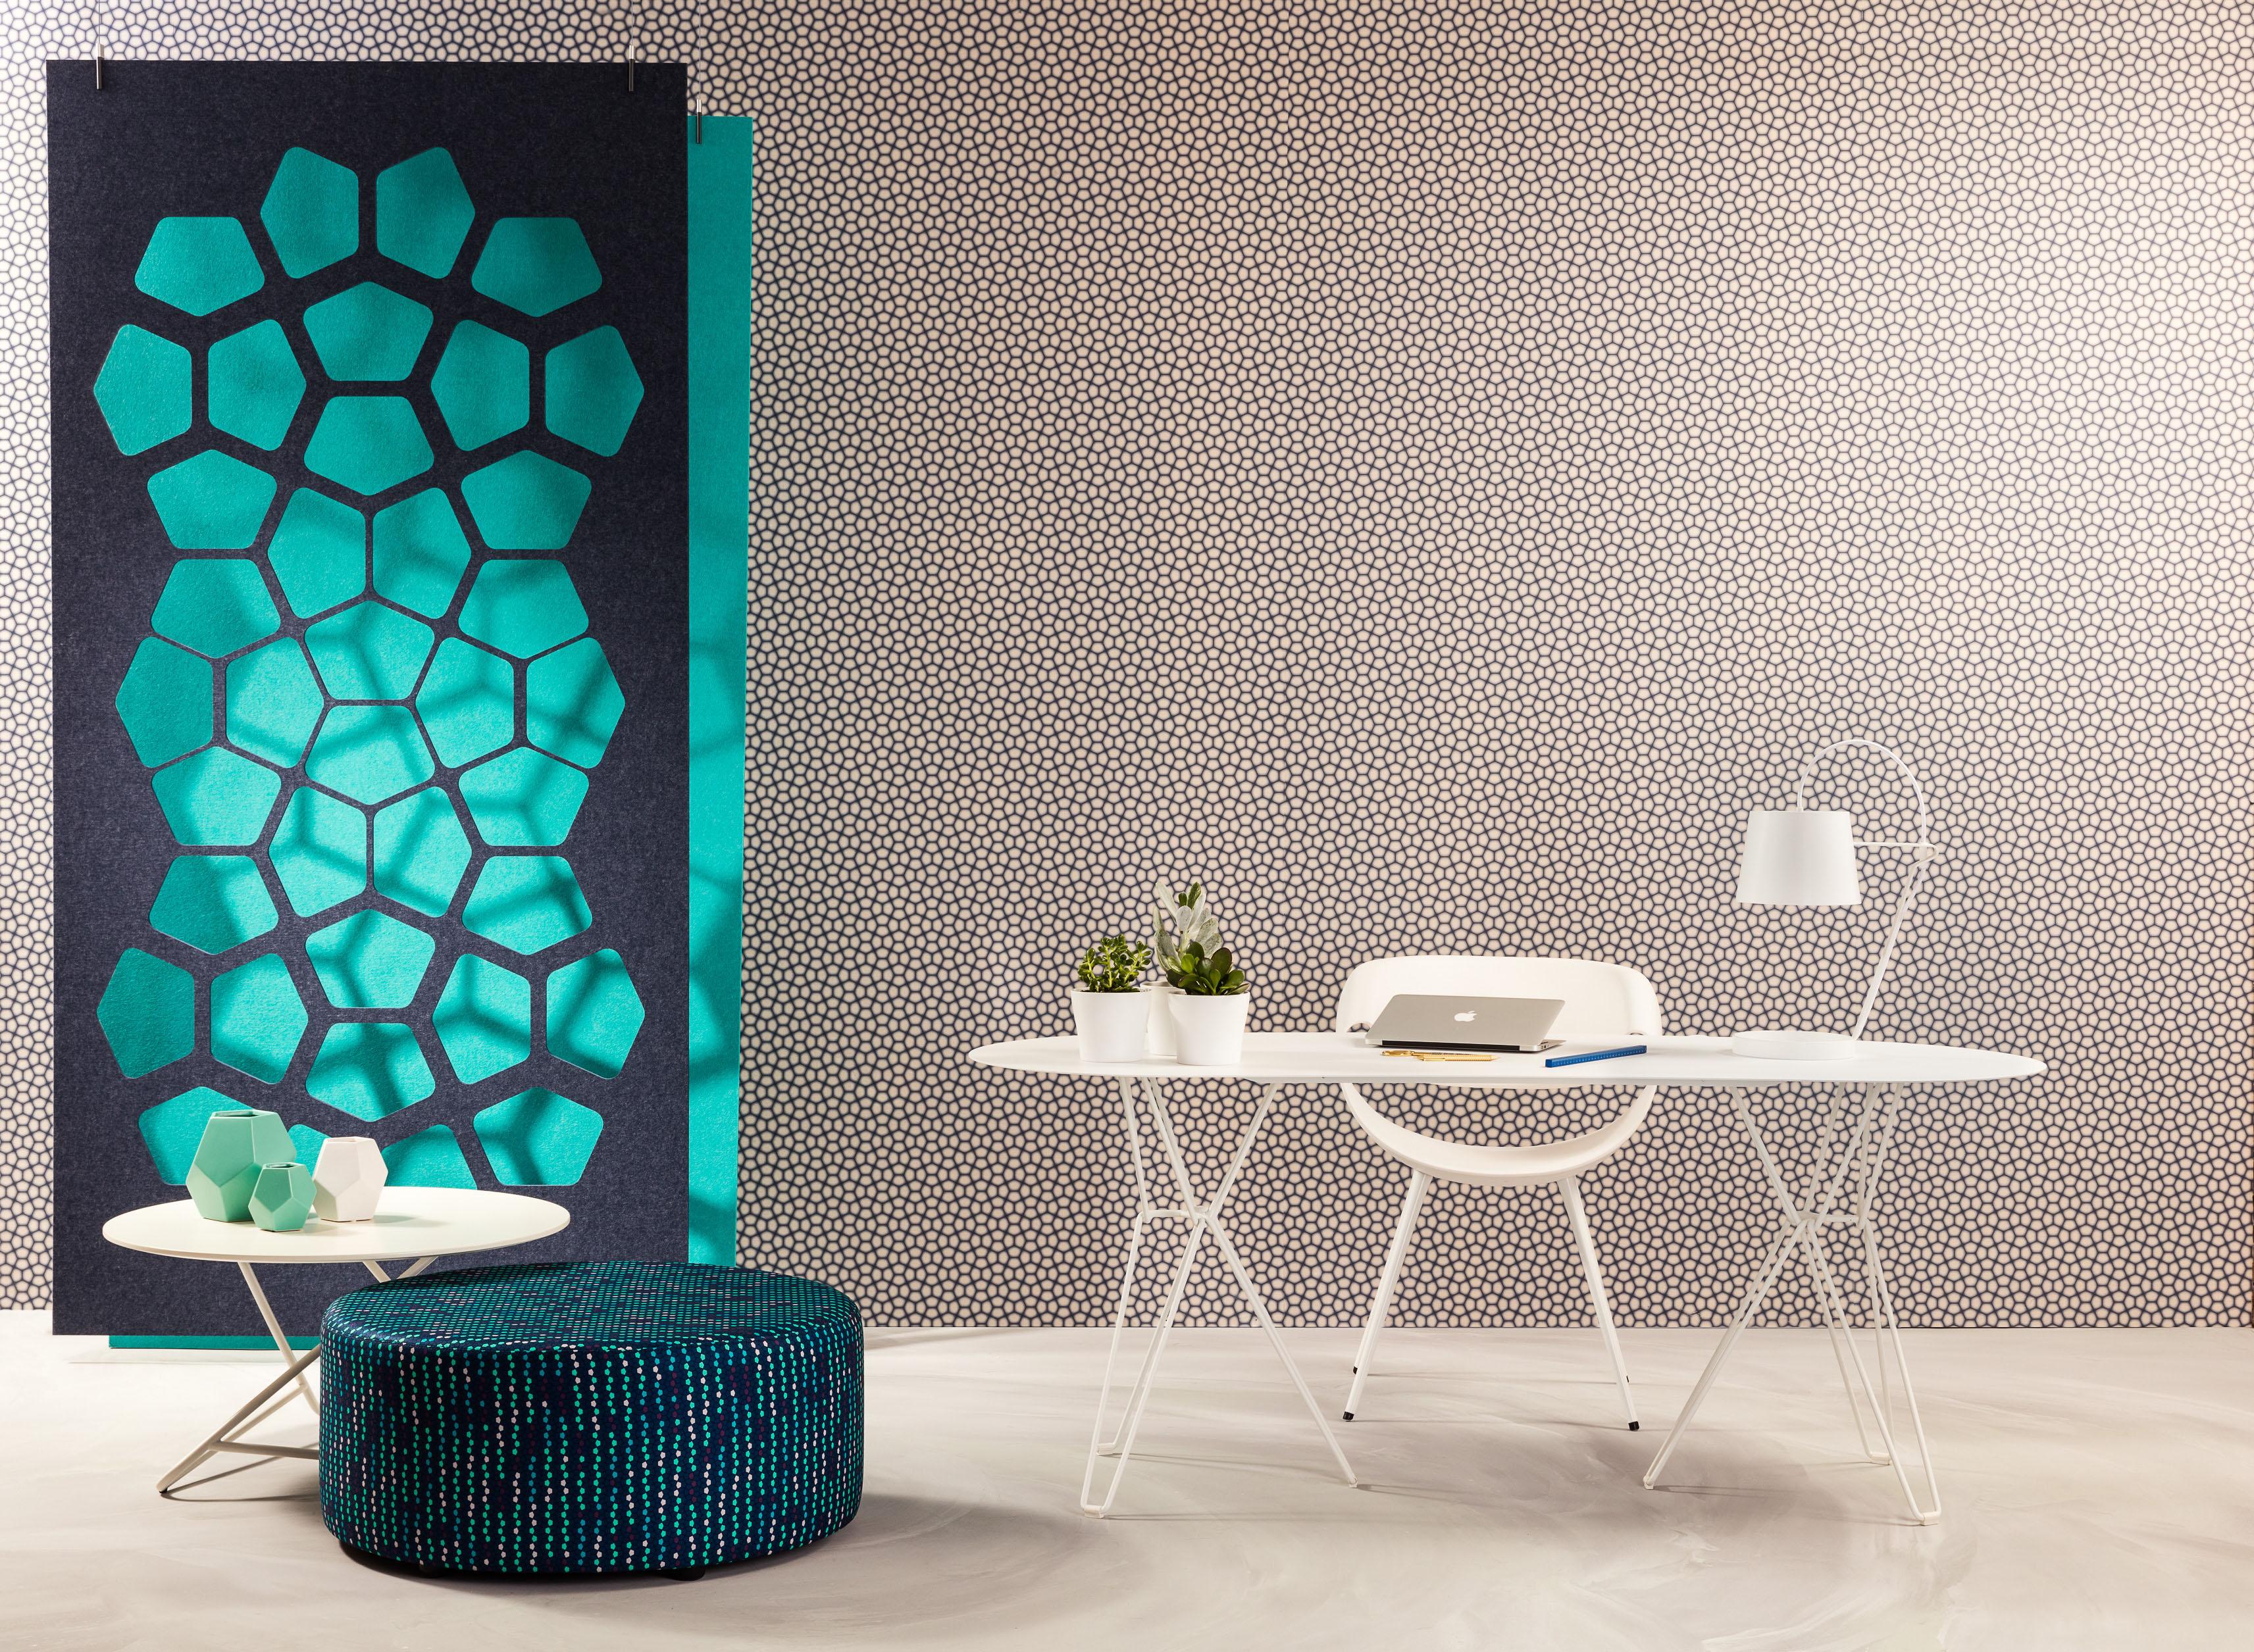 Ep-Mura-Fabric-Glow-365-Woven-Image-1